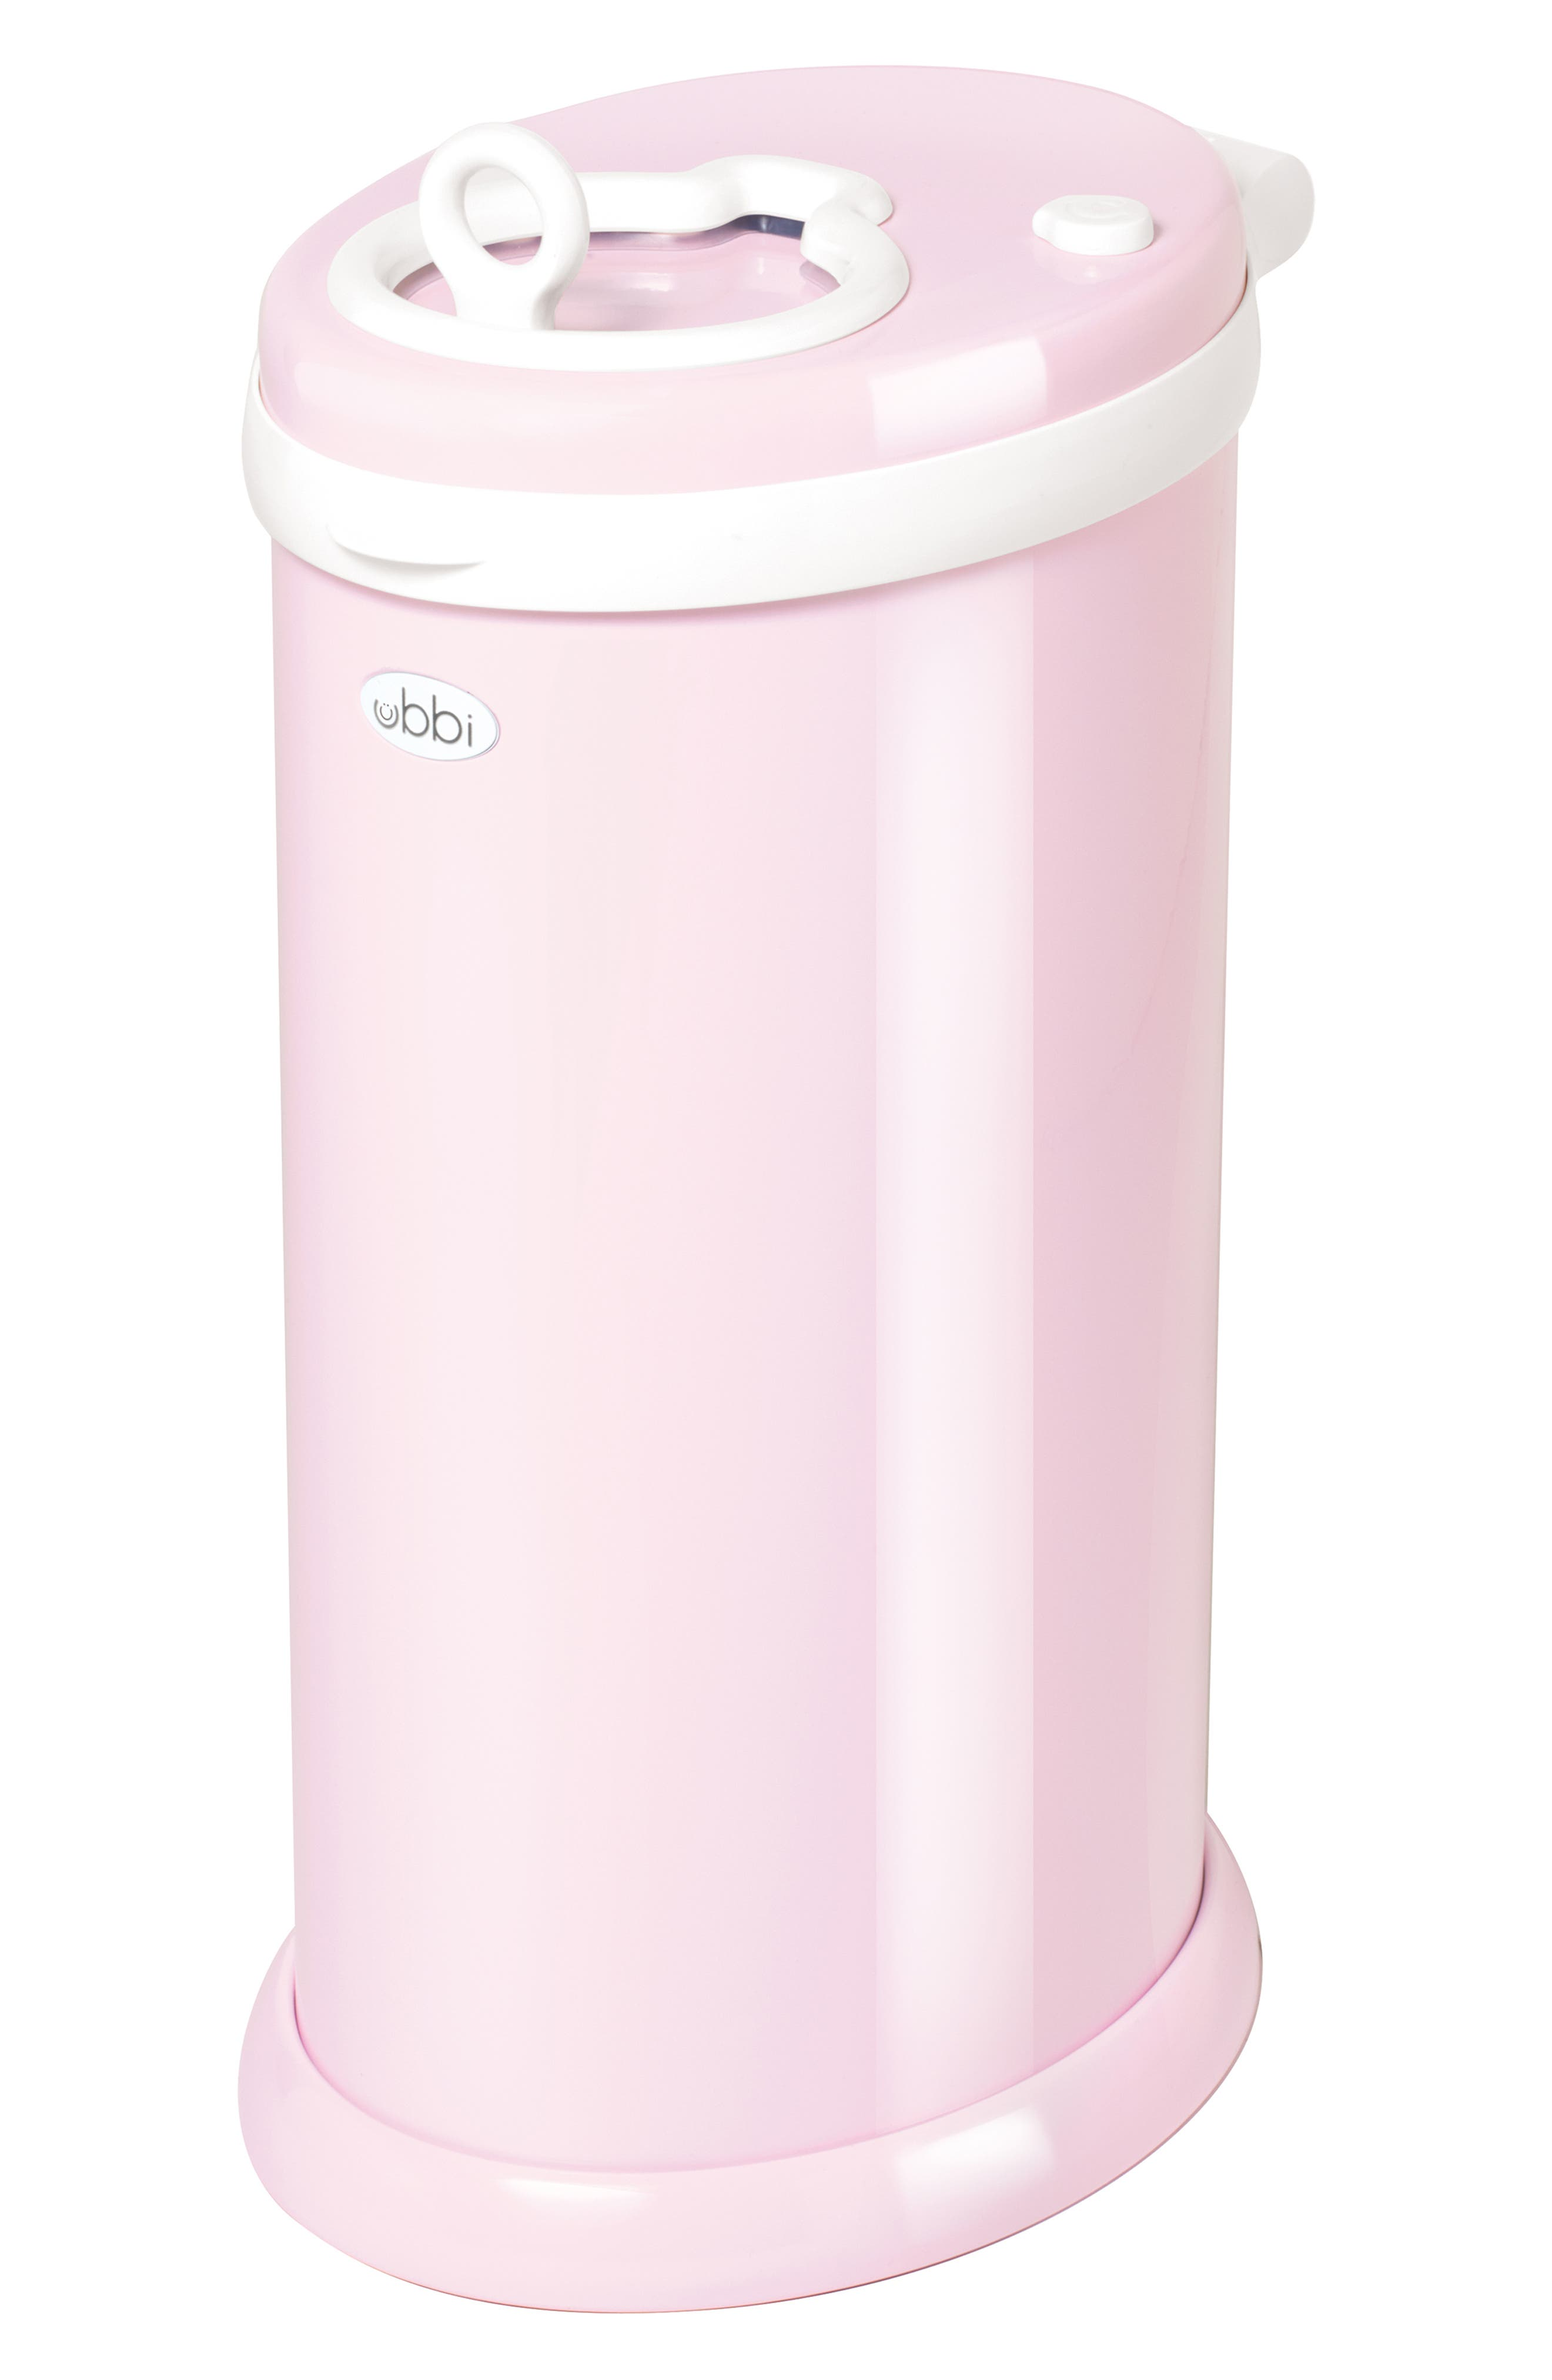 Infant Ubbi Diaper Pail Size One Size  Pink